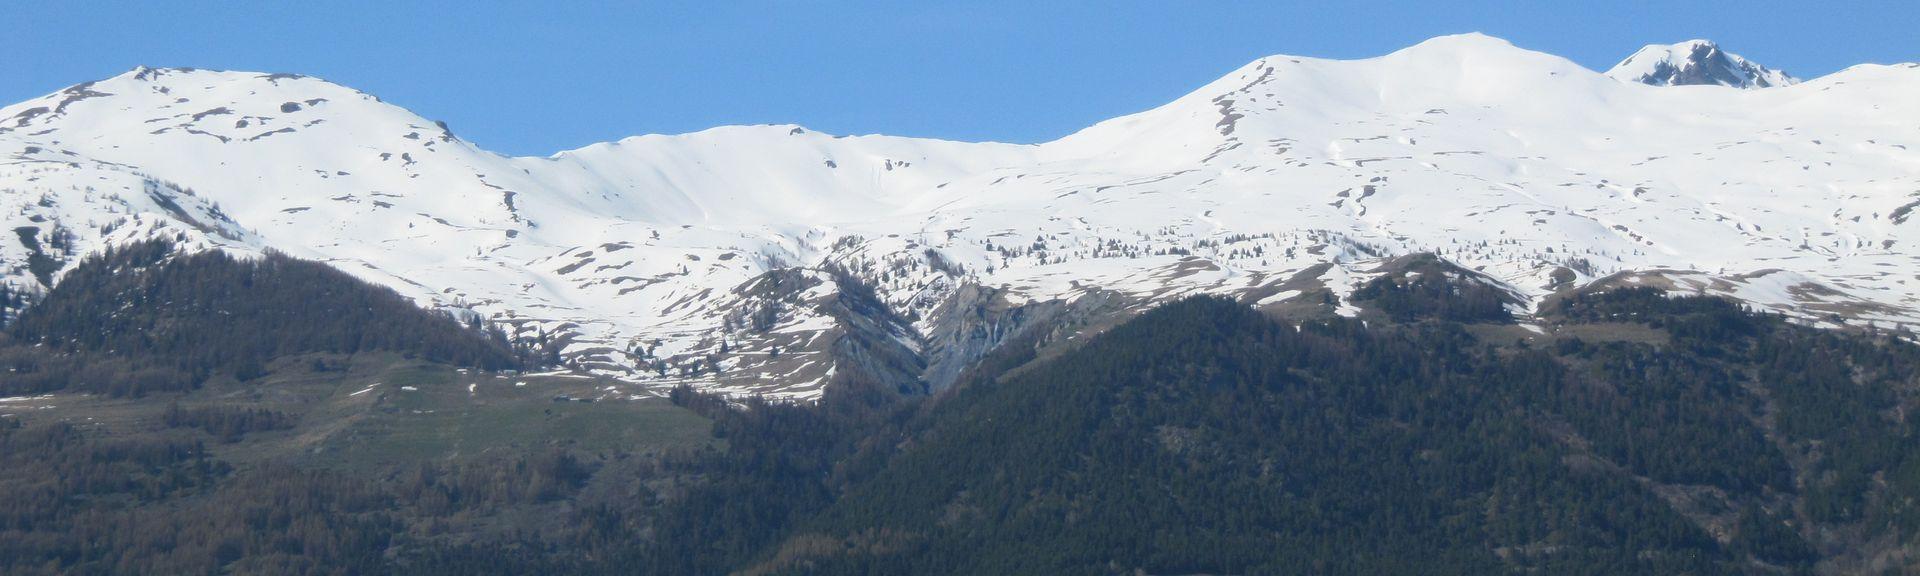 La Thuilen talviurheilualue, La Thuile, Aostanlaakso, Italia